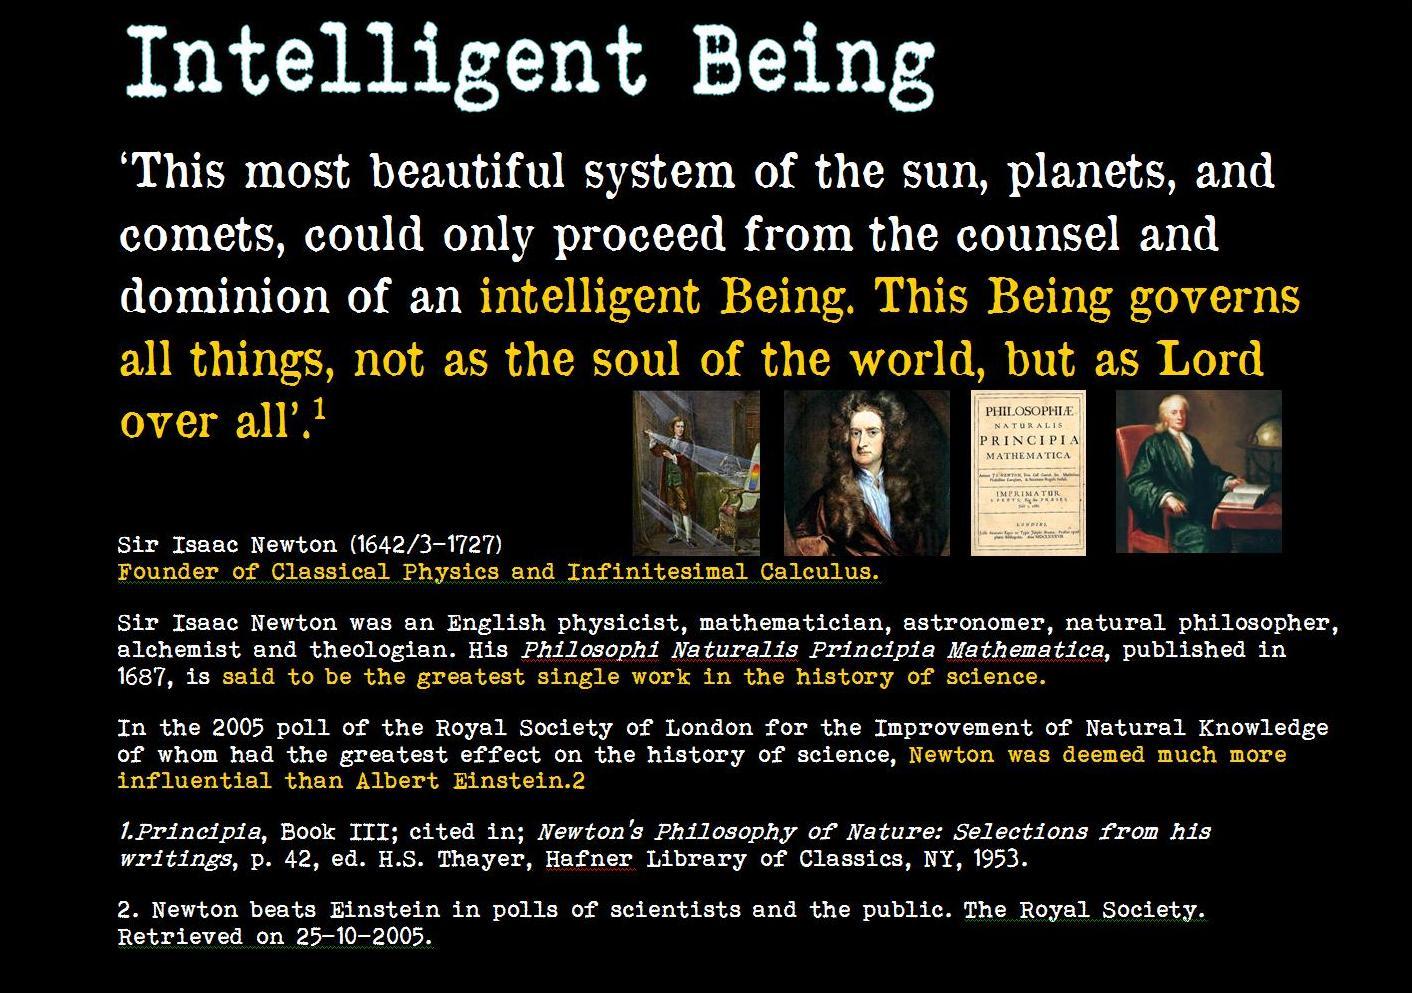 isaac quotes pdf newton 2010 november hunter of creation friends ministries - Isaac Newton Lebenslauf